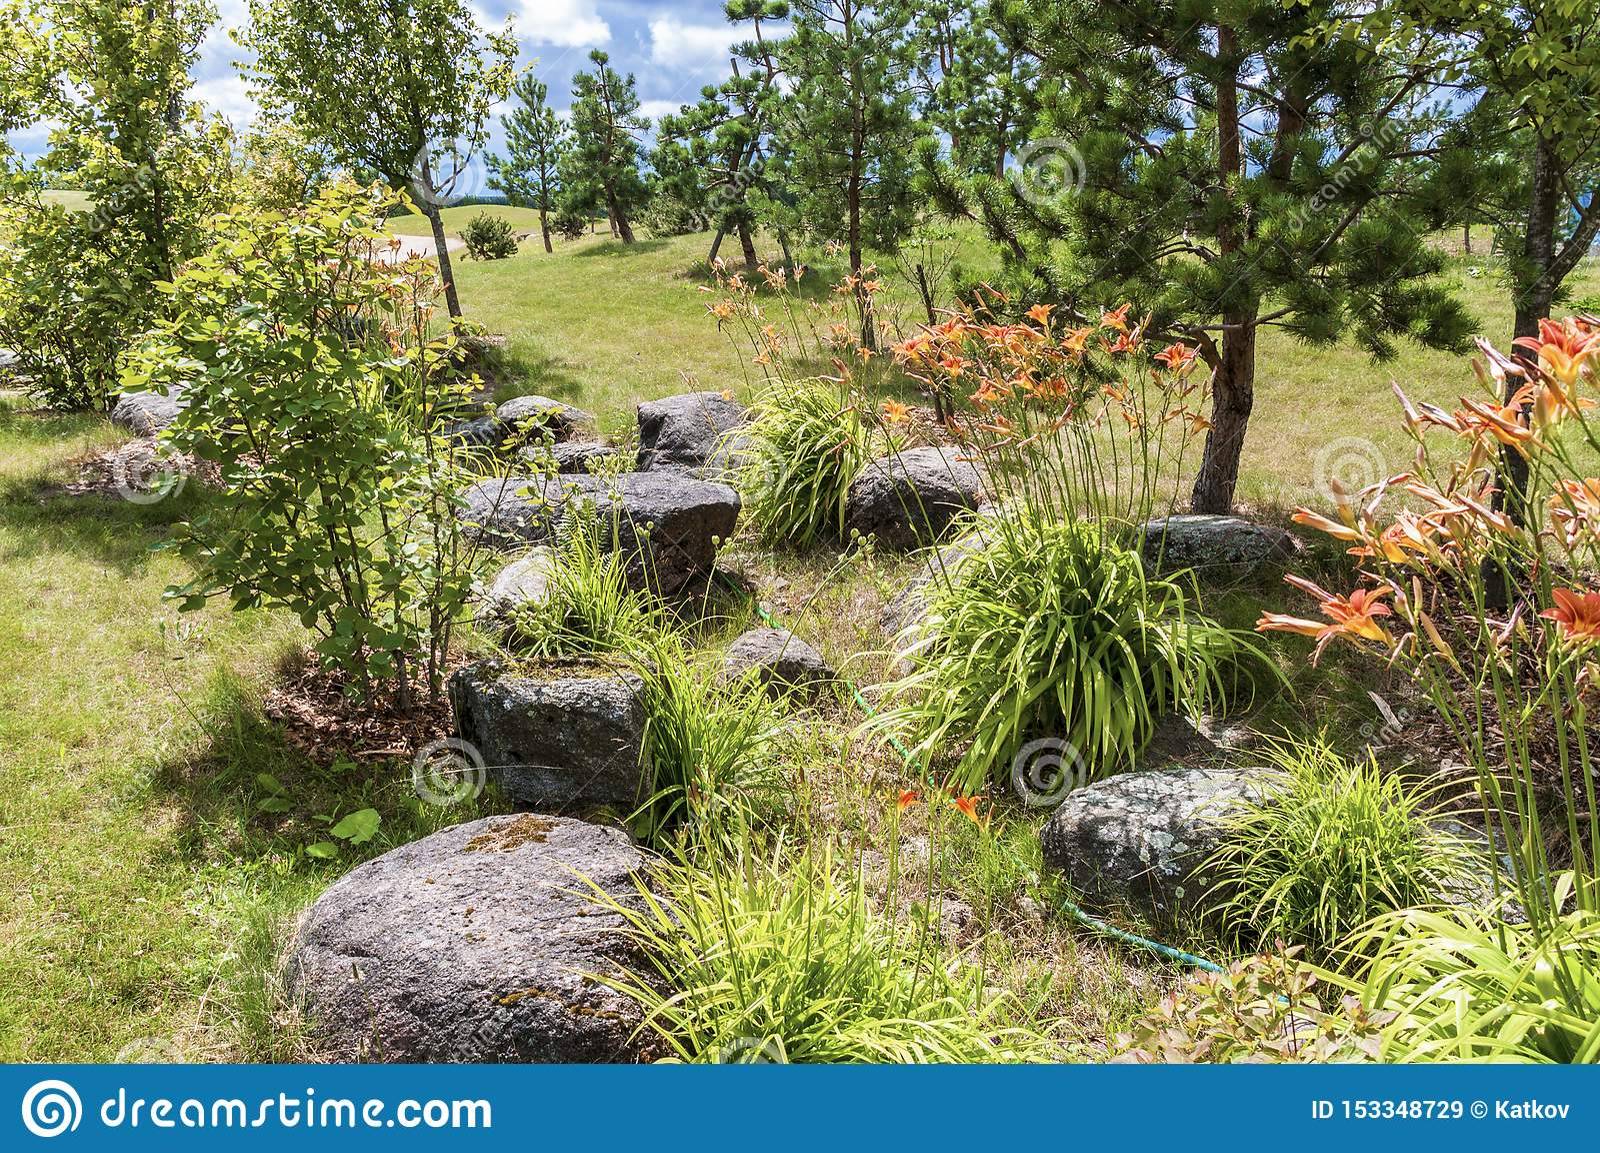 Natural Stone In Landscape Design Stock Image Image Of Landscape Grass 153348729